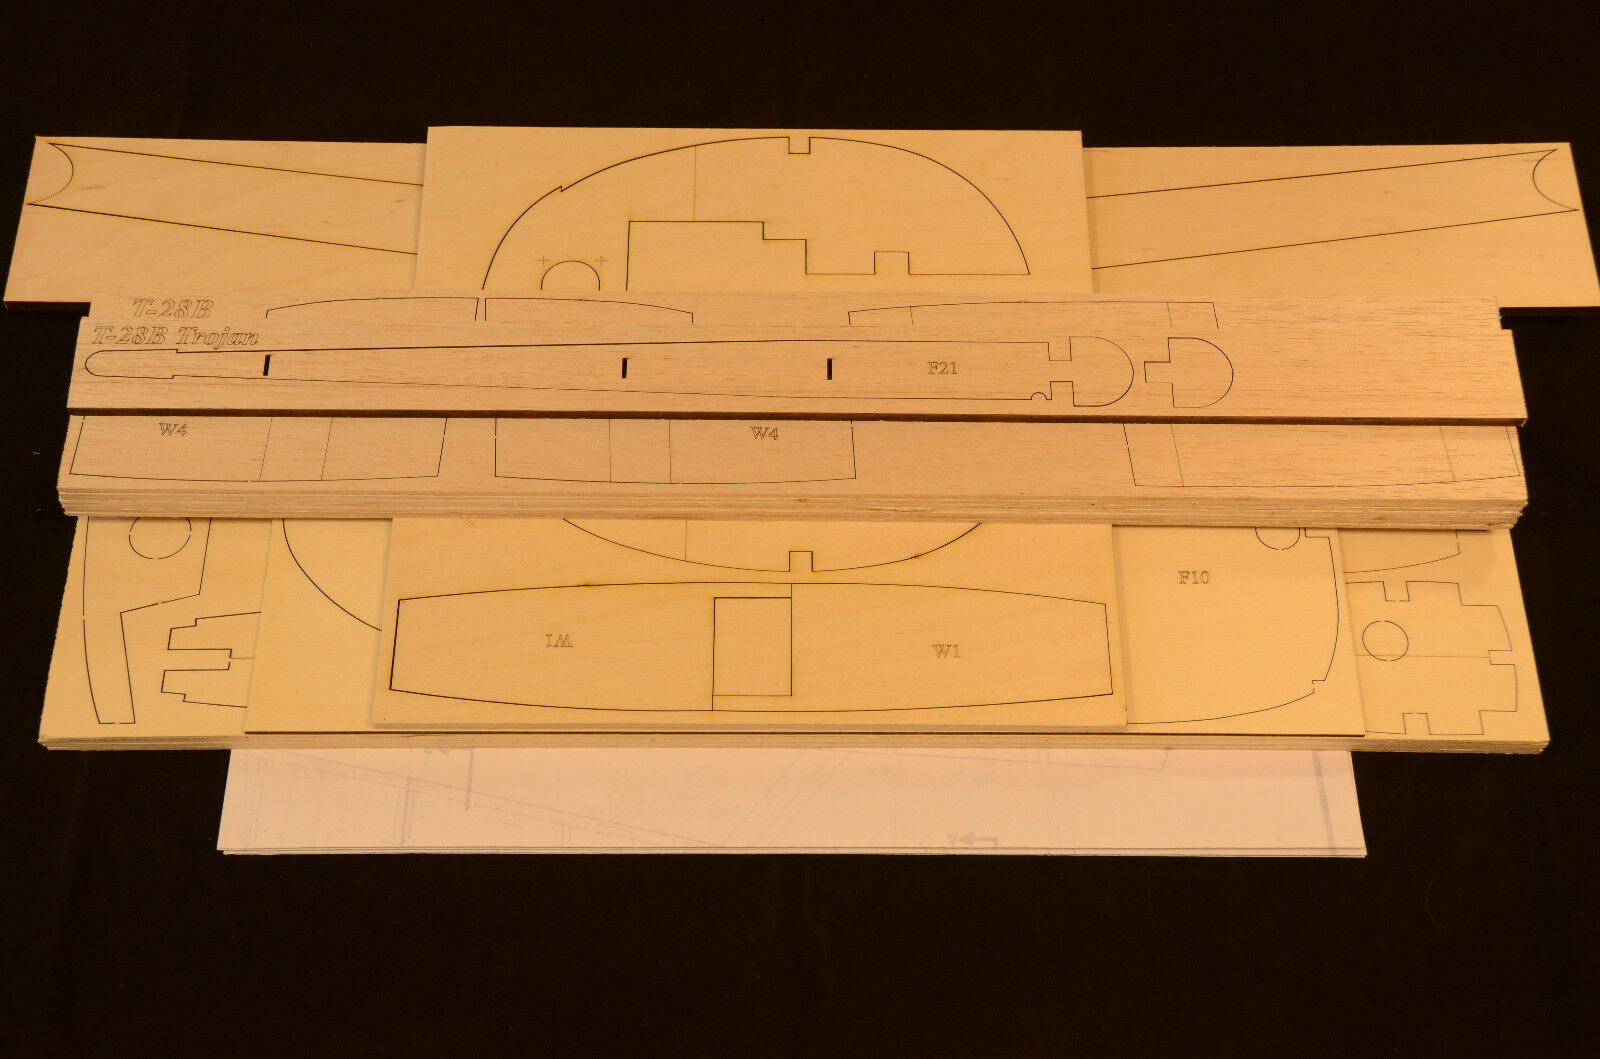 Large 1 5 Scale T-28B TROJAN Laser Cut Short Kit & Plans 82 in. wing span.